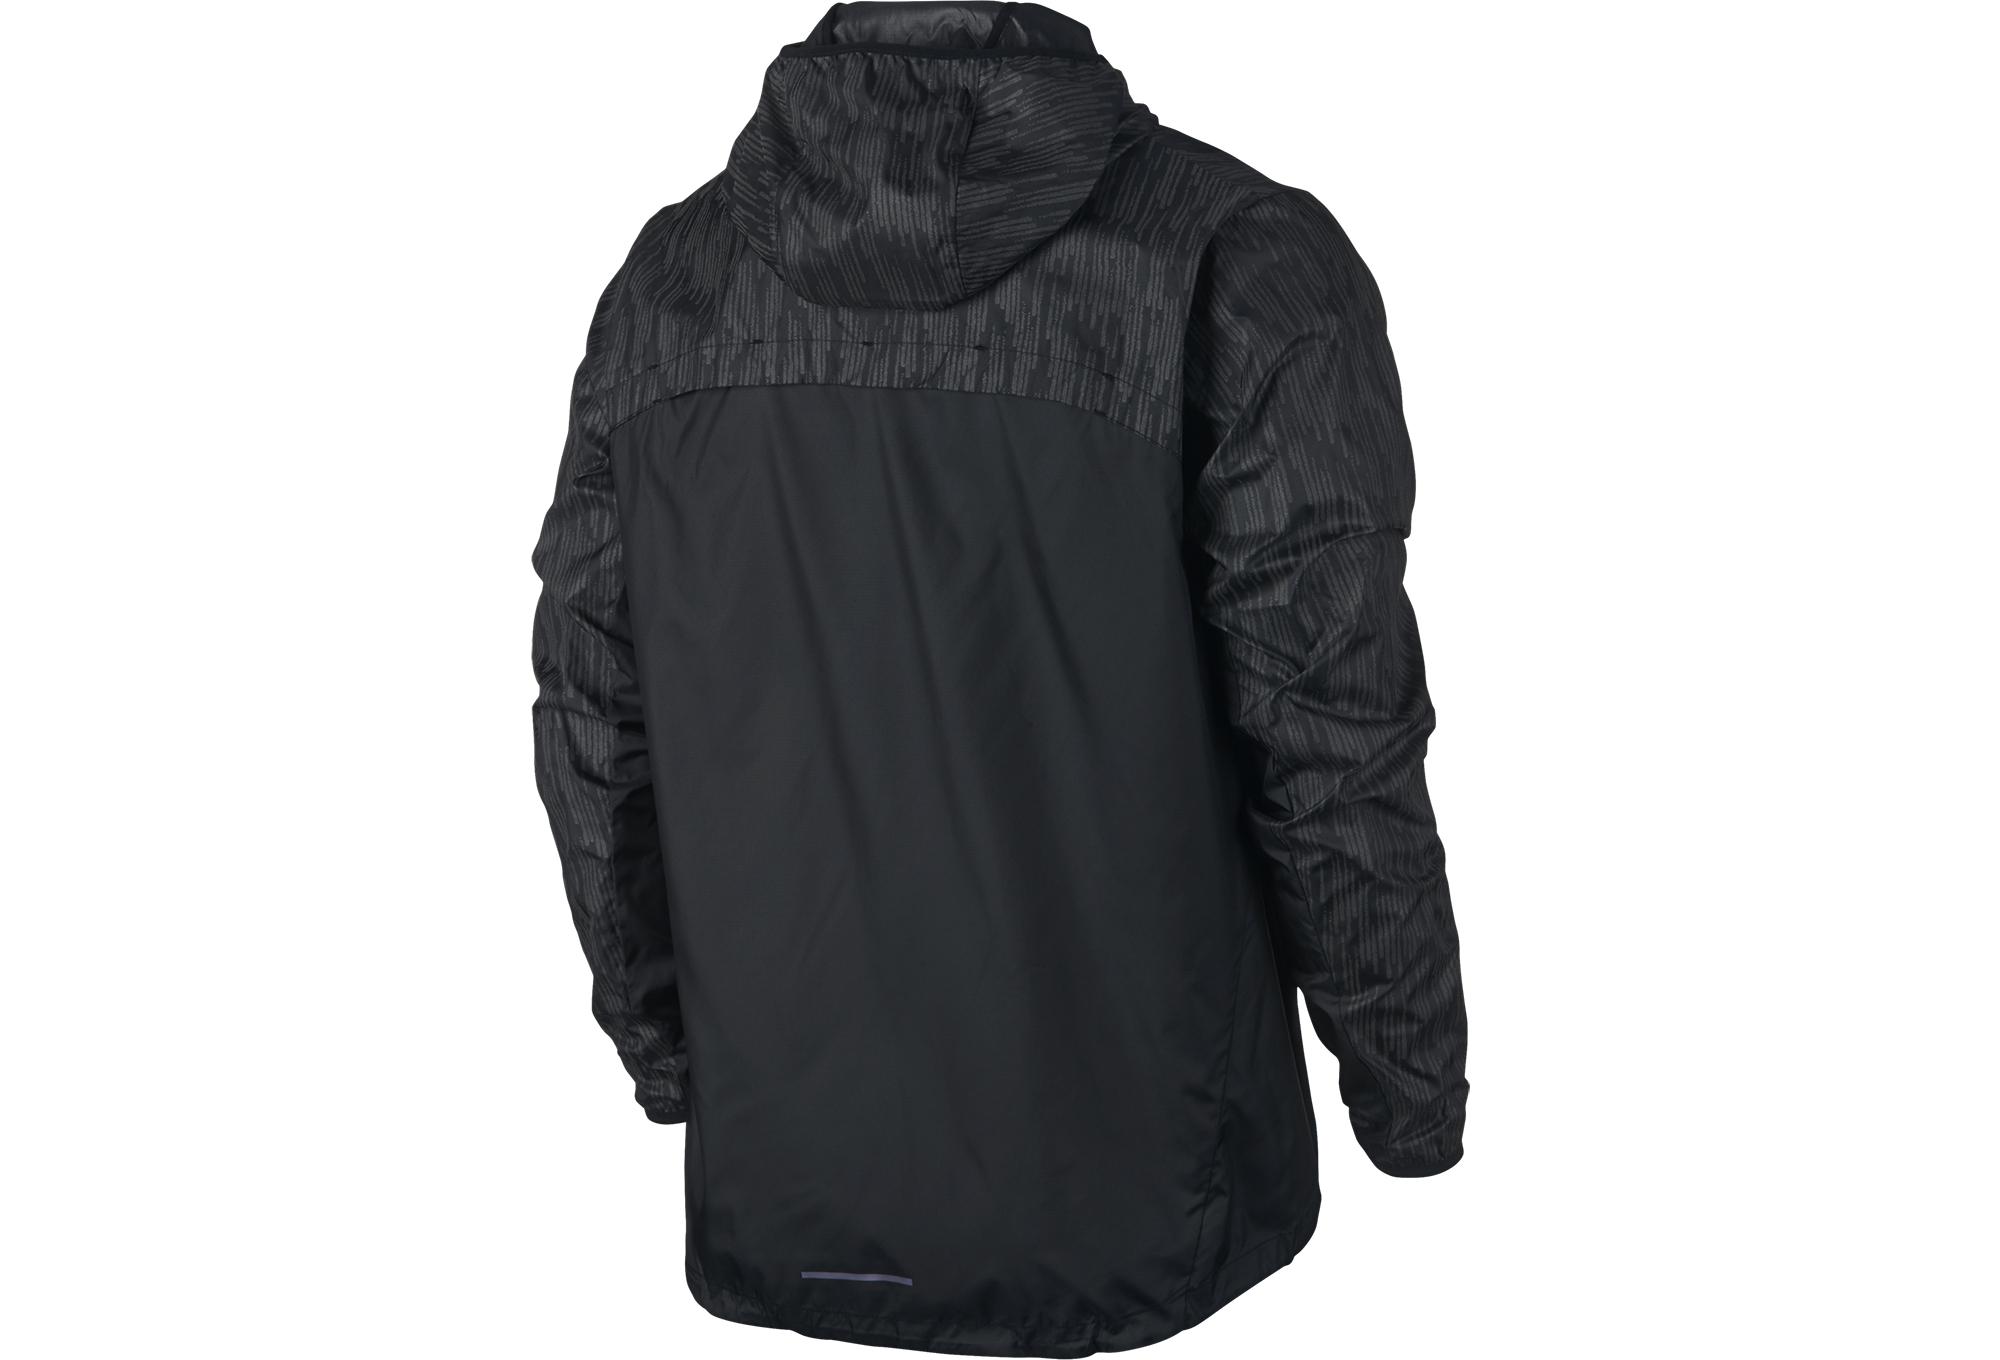 pre order many styles sale Veste Coupe-Vent Homme NIKE SHIELD FLASH Noir